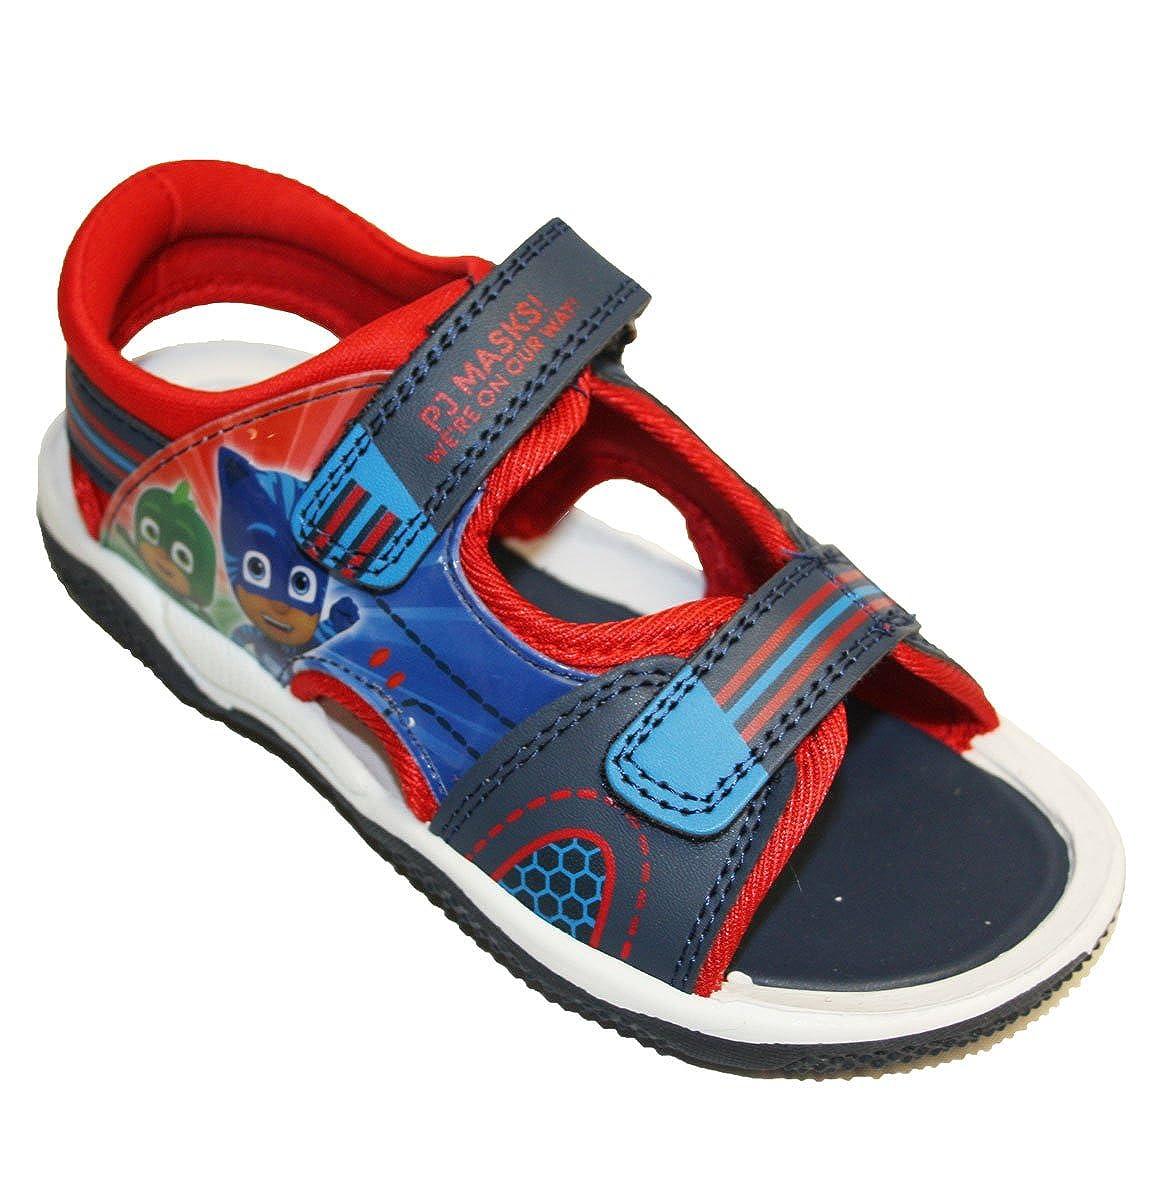 'PJ Masks' Boys Sports Sandal Beach Walking Childrens Shoes 5-10 UK (9 UK 27 EUR)